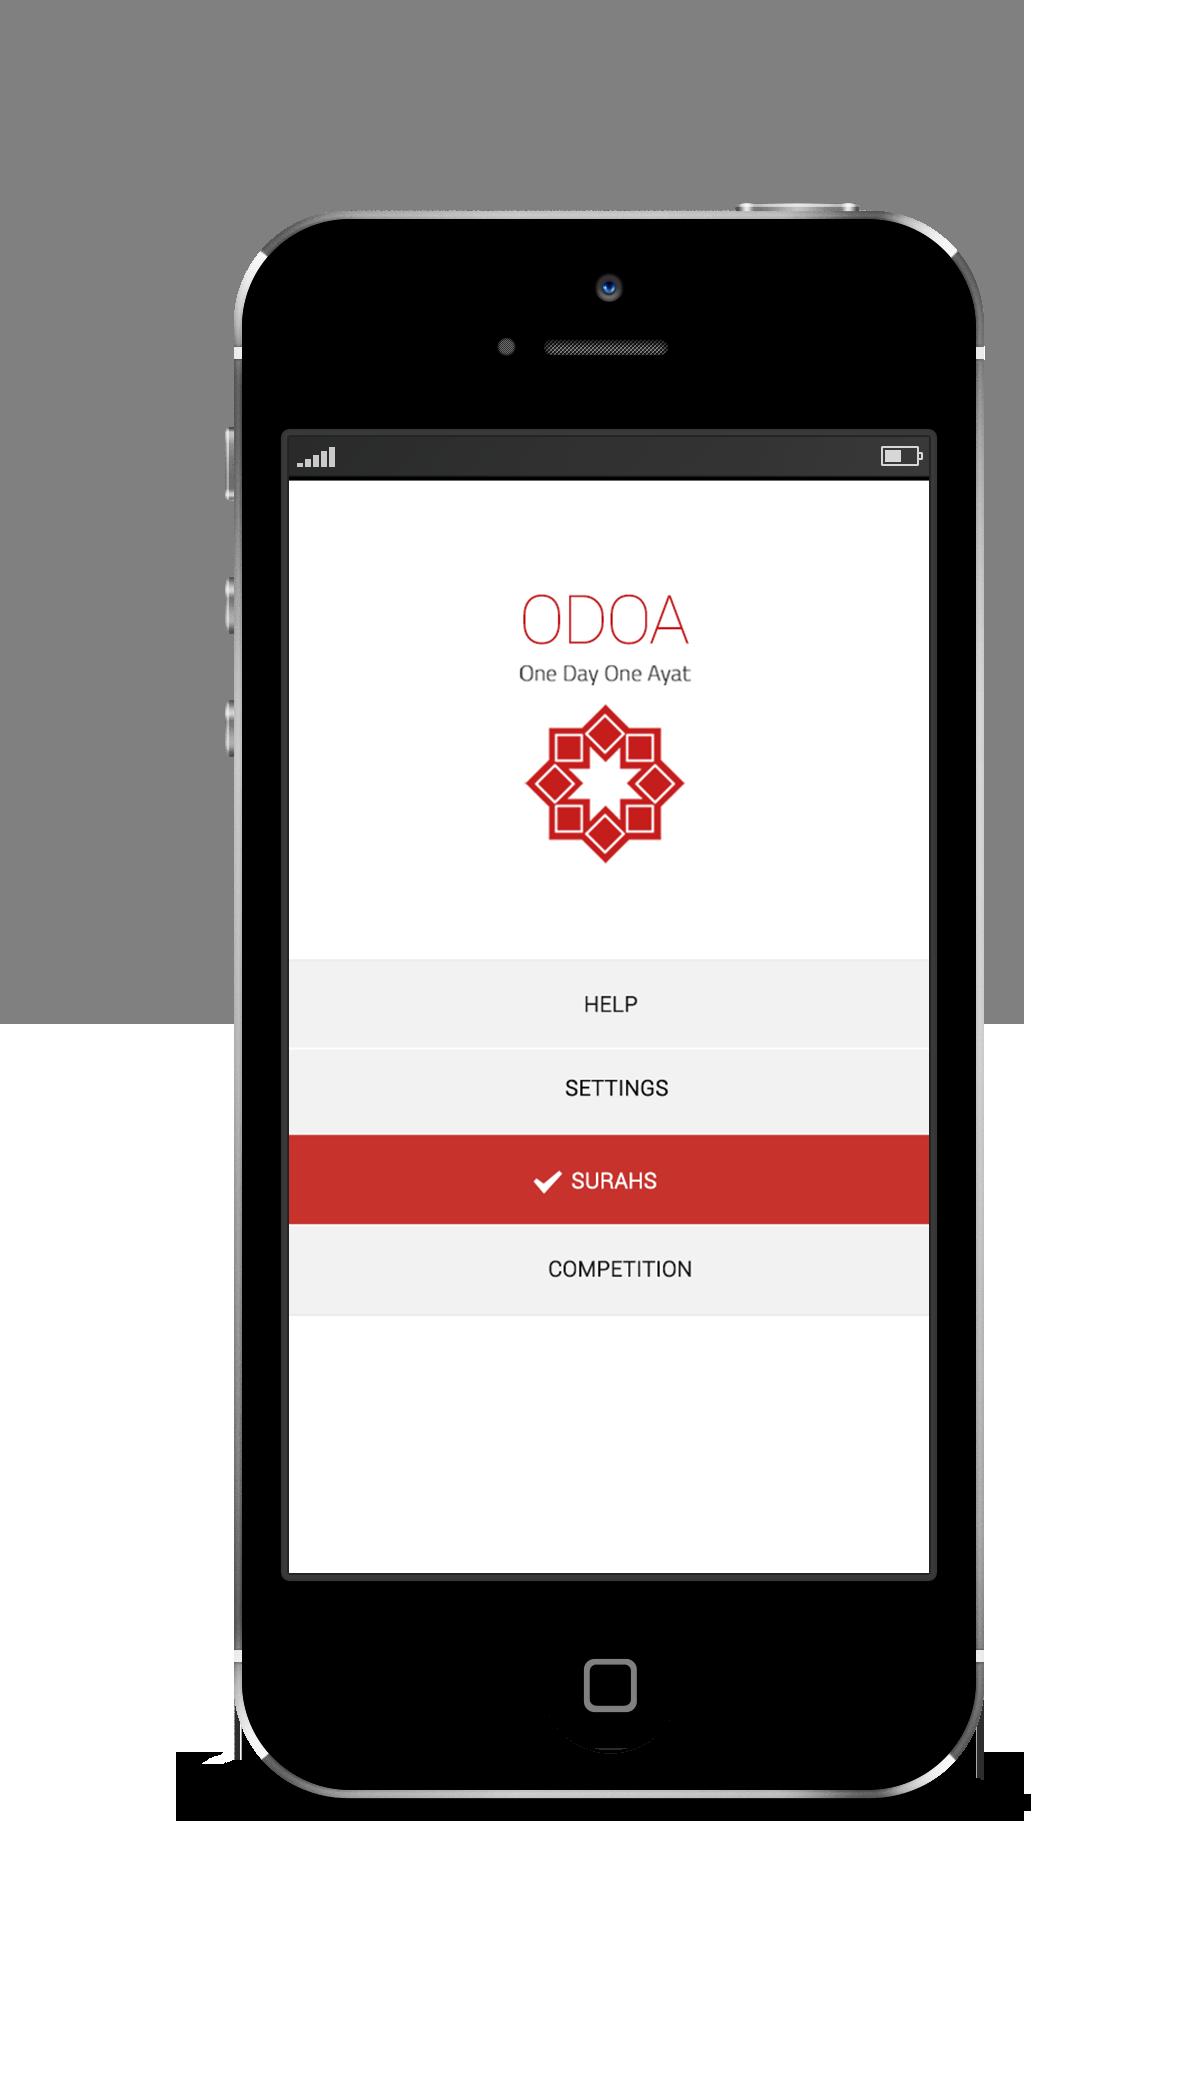 Aplikasi Odoa One Day One Ayat Aplikasi Untuk Mempermudah Umat